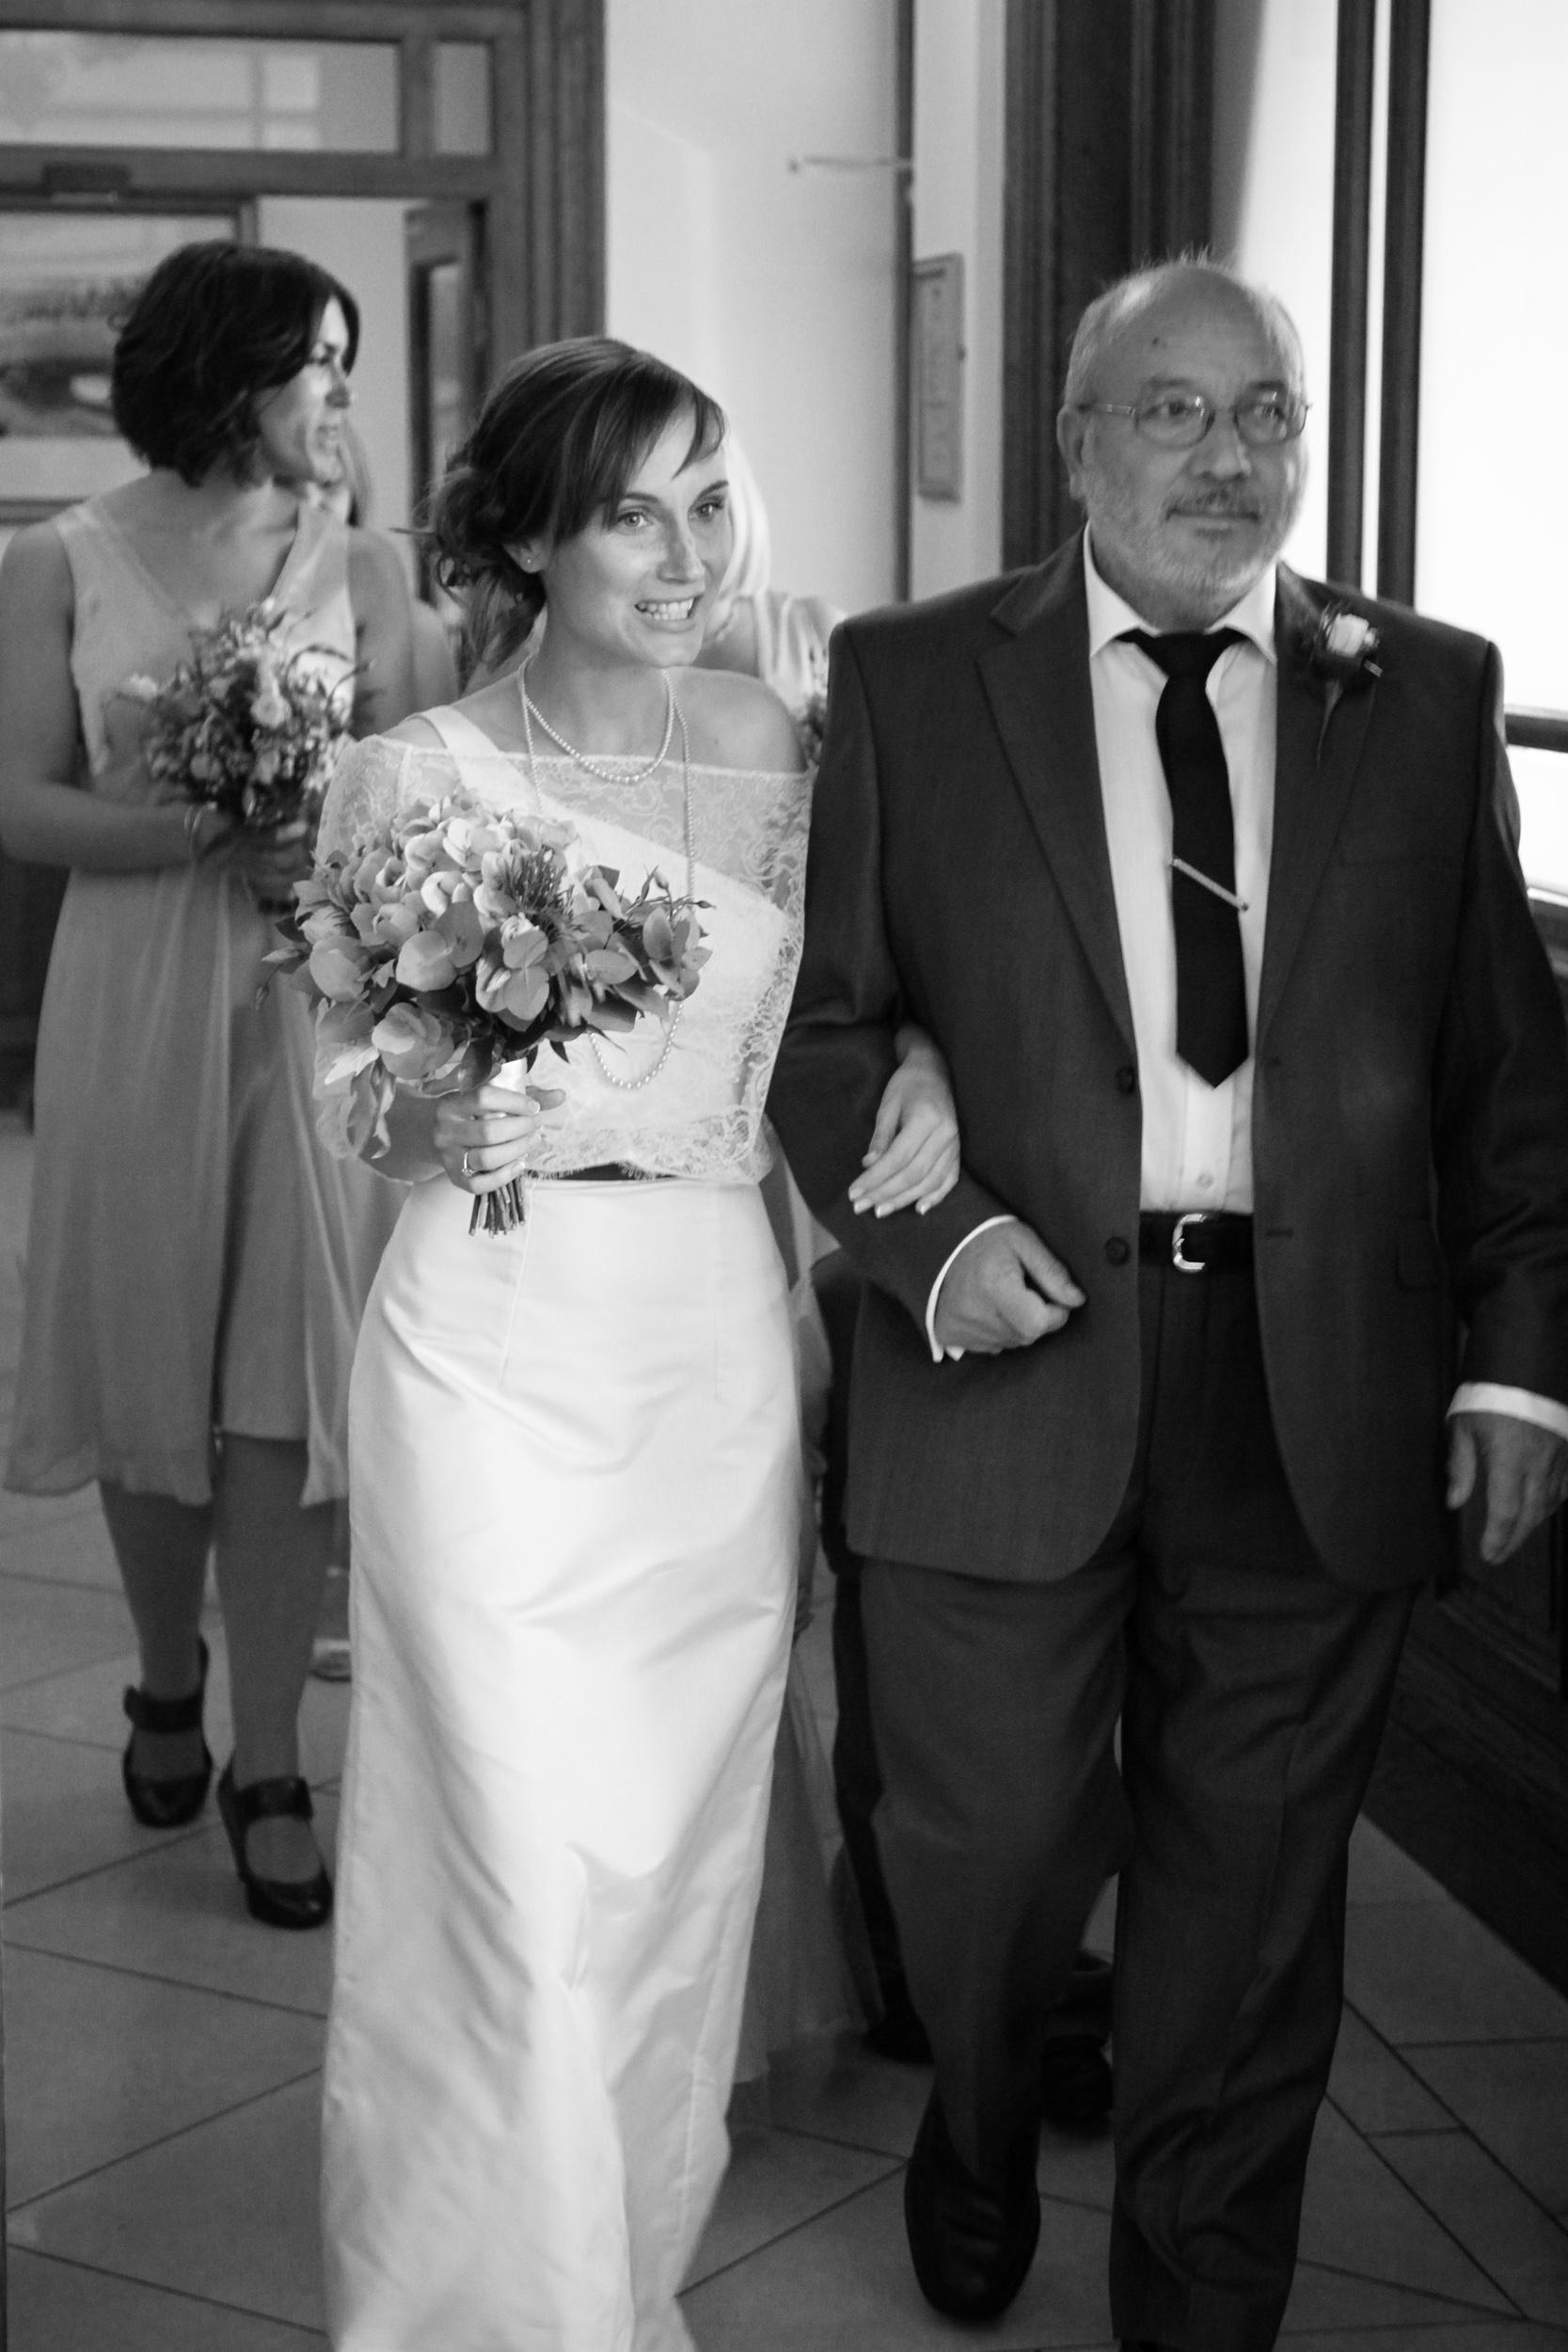 Alexandra-bespoke-wedding-dress-Kate-Beaumont-1.jpg